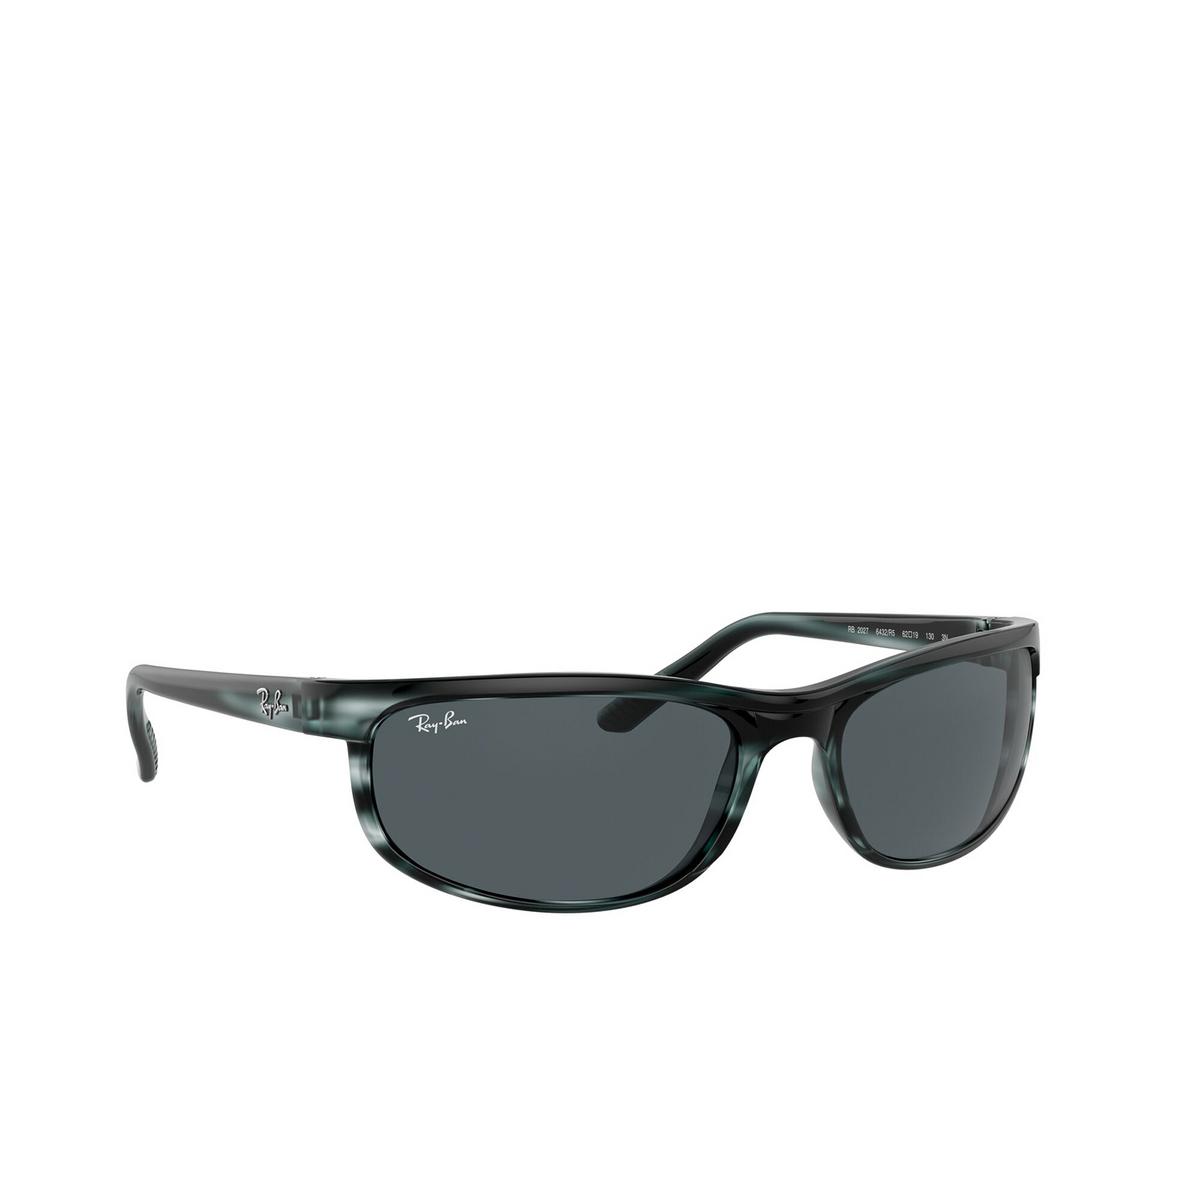 Ray-Ban® Rectangle Sunglasses: Predator 2 RB2027 color Striped Blue Havana 6432R5 - three-quarters view.